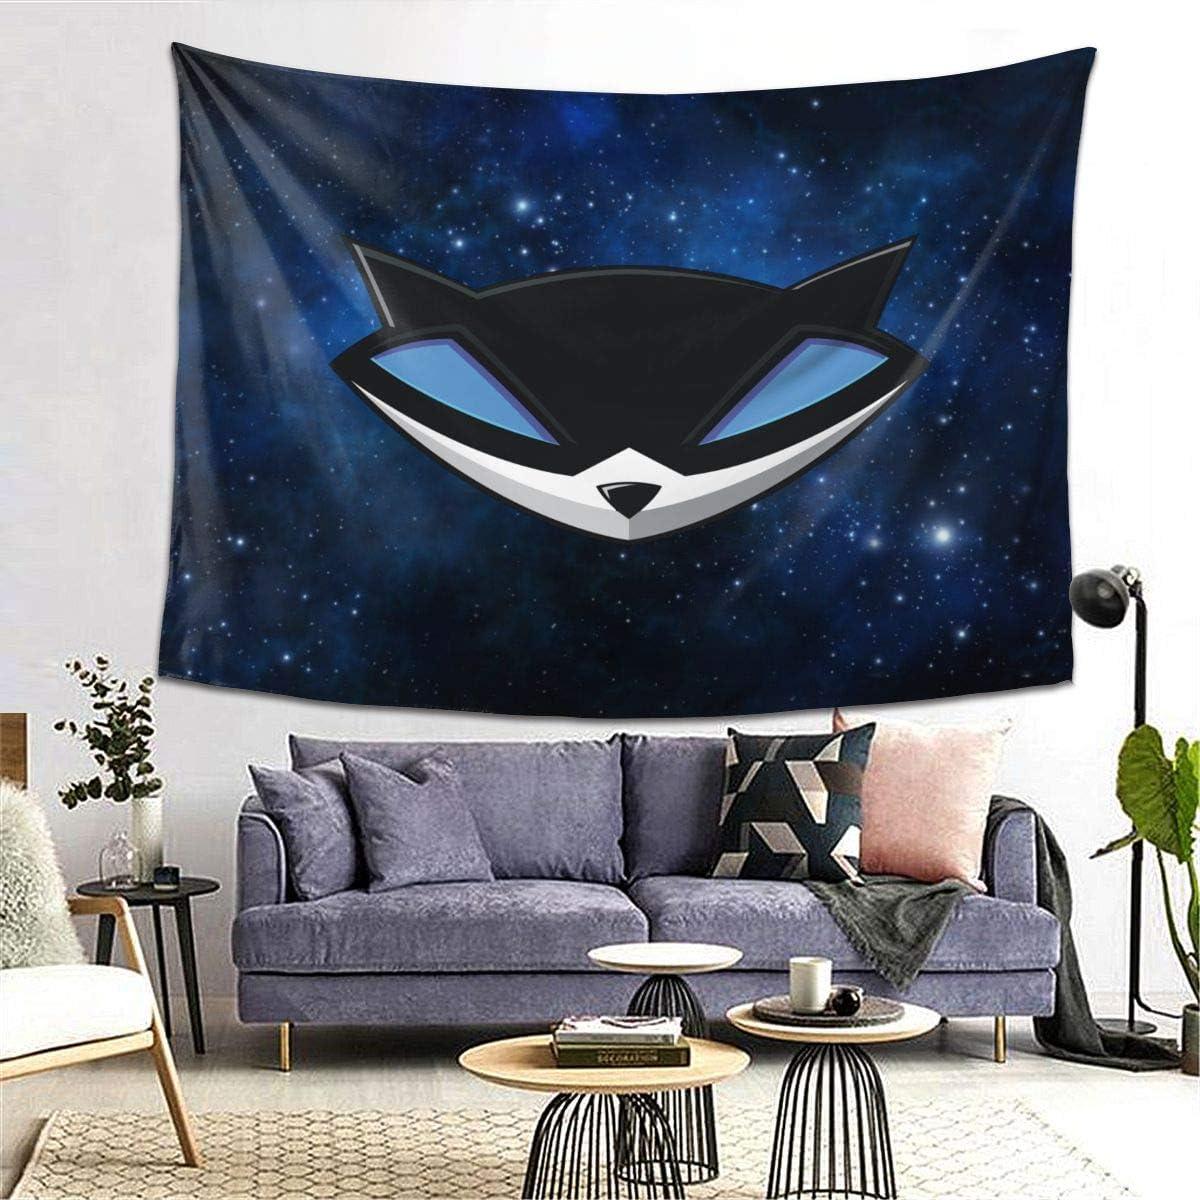 Winsle Modern Art Tapestry Sly Cooper Logo Home Decor Wall Hanging for Living Room Bedroom Dorm 80 x 60inch